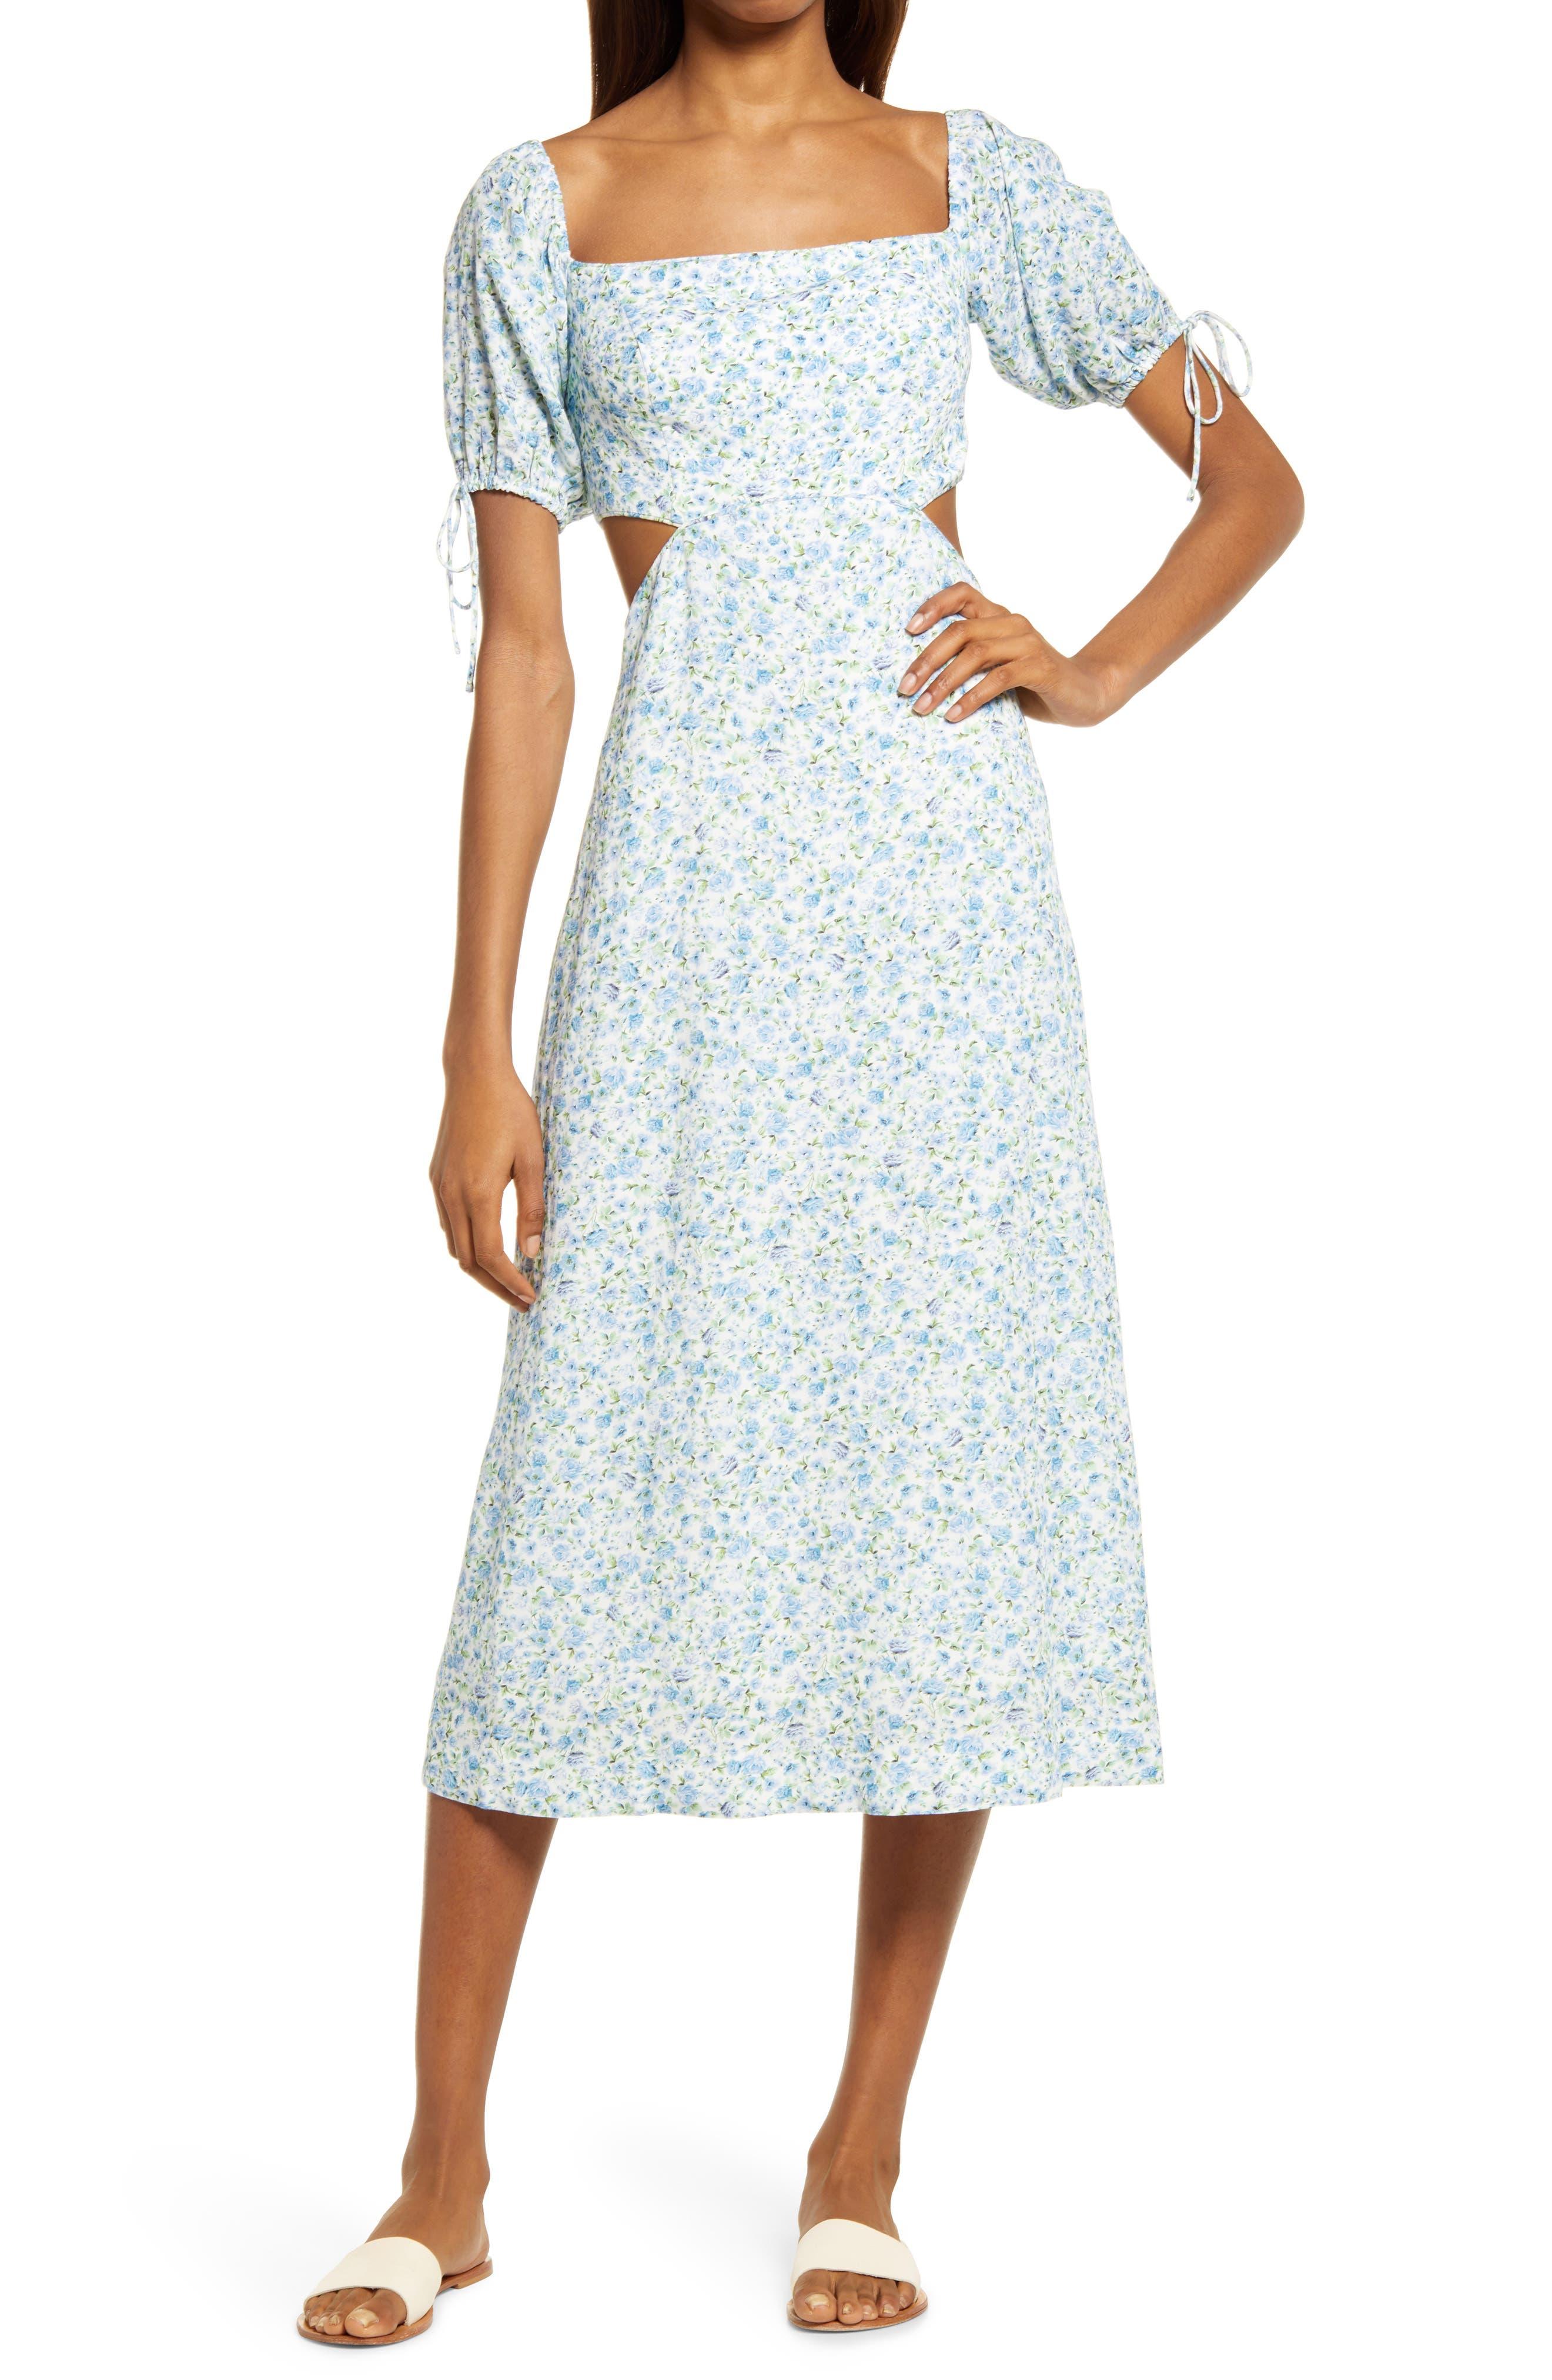 Square Neck Cutout Dress